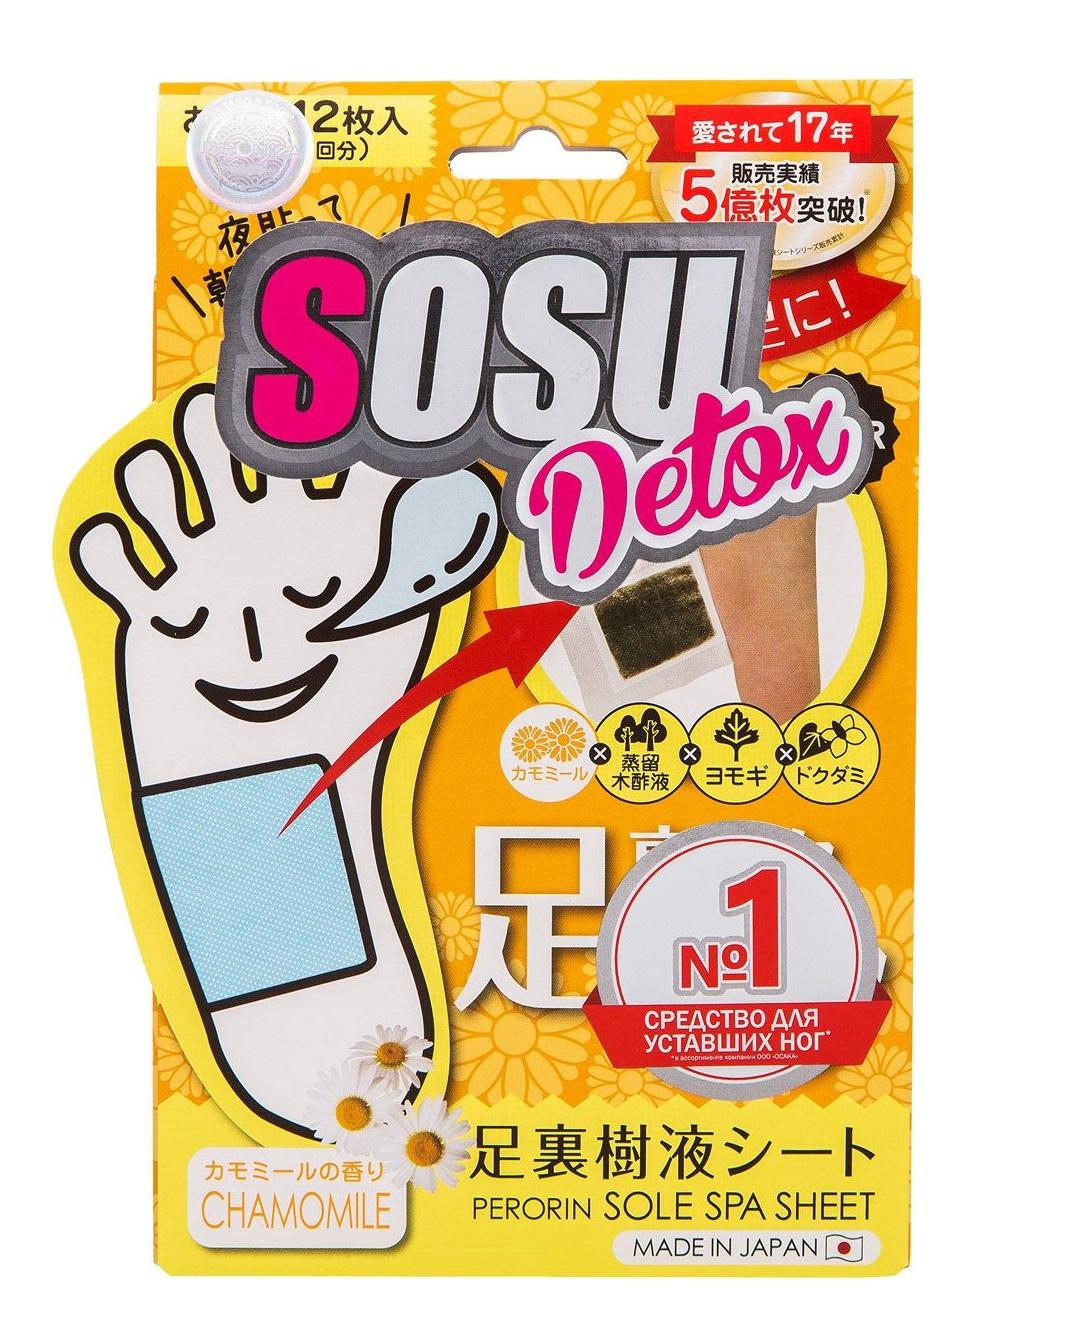 SOSU Патчи для ног с ароматом ромашки / Perorin Detox 6 пар фото